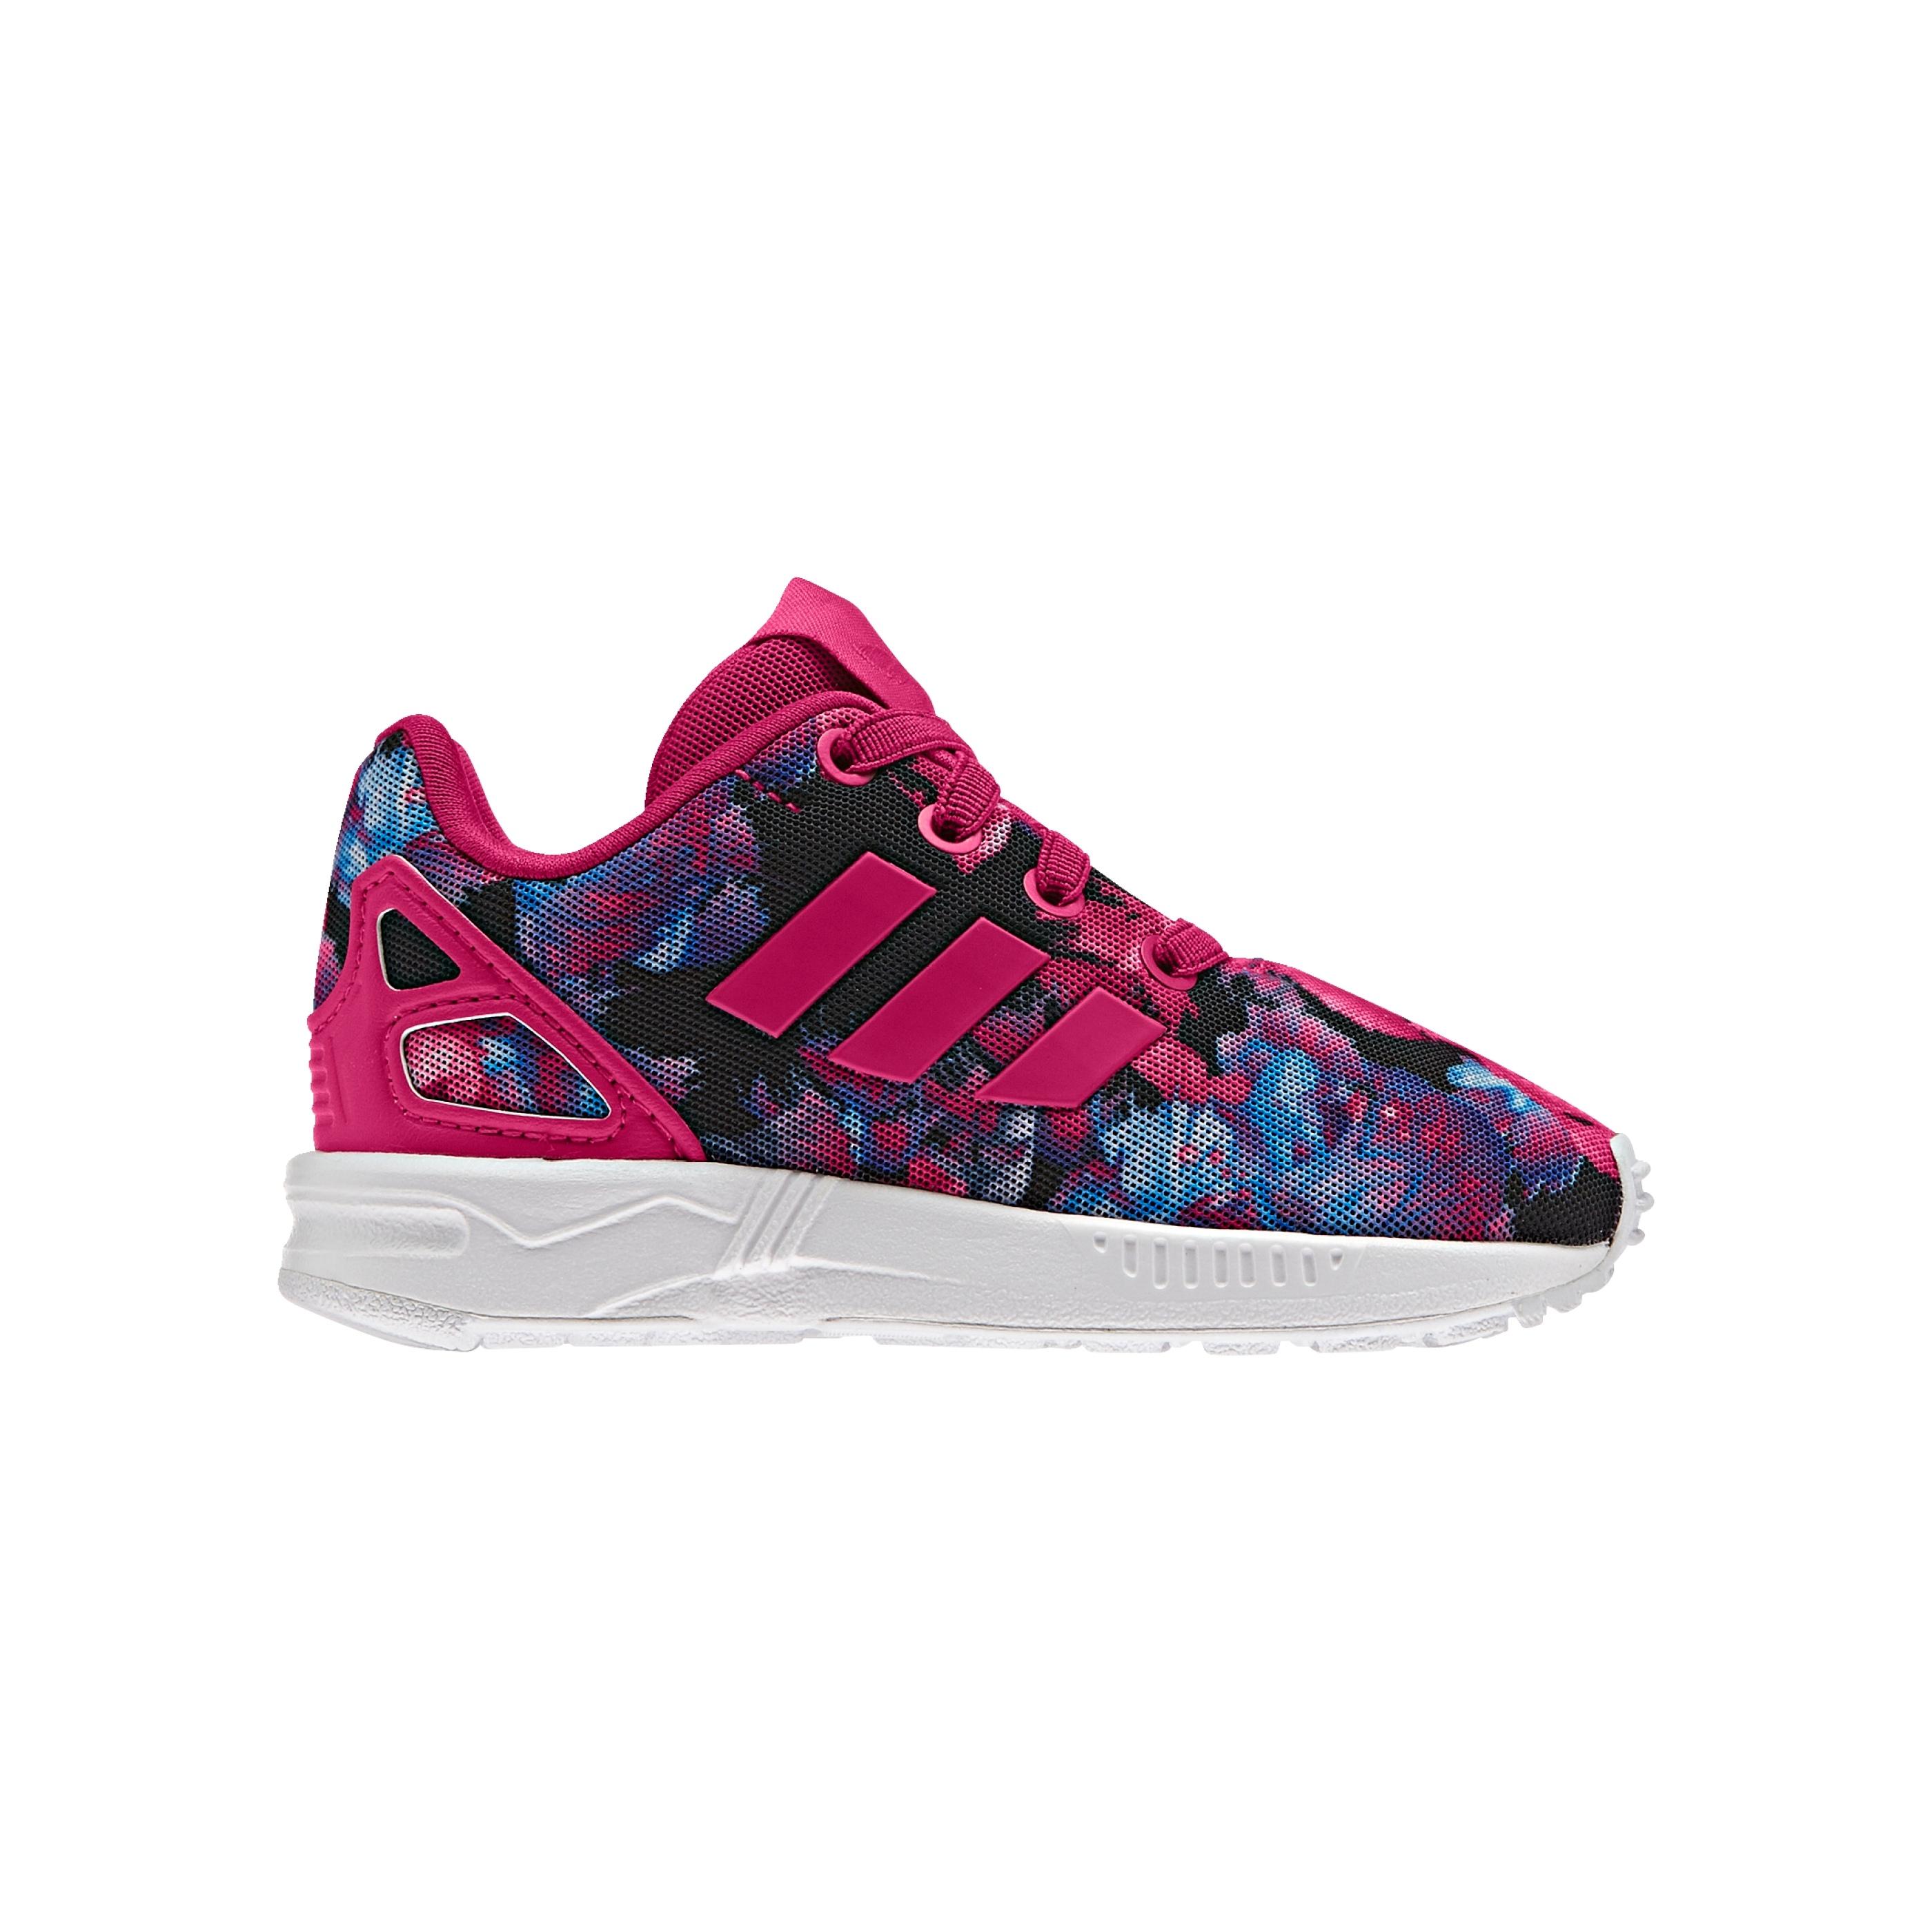 magasin d'usine 8c255 94013 coupon code for adidas originals zx flux rose 9ec5e 815e0